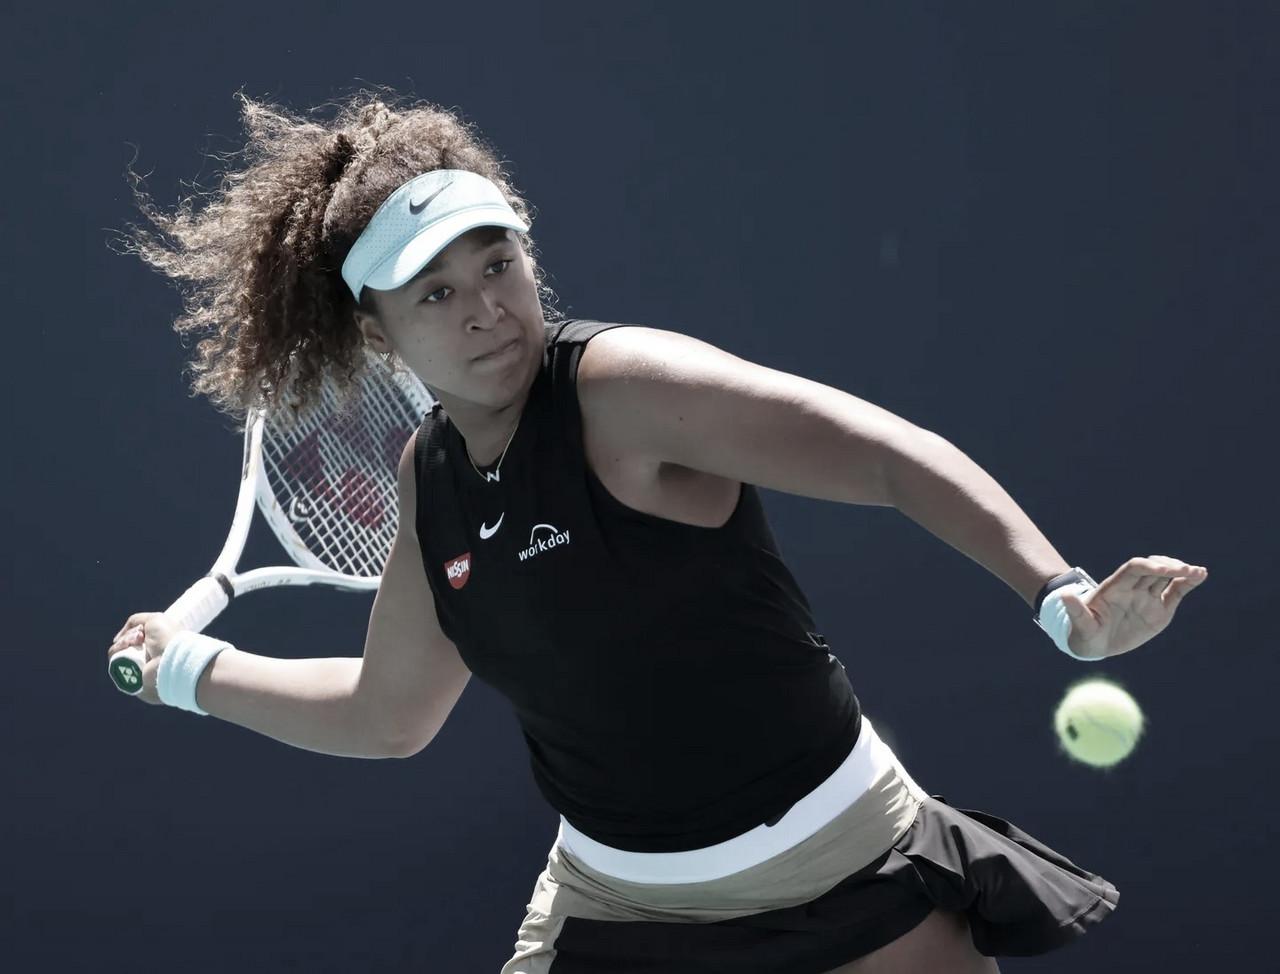 Osaka confirma favoritismo contra Tomljanovic em Miami; Anisimova bate Stephens